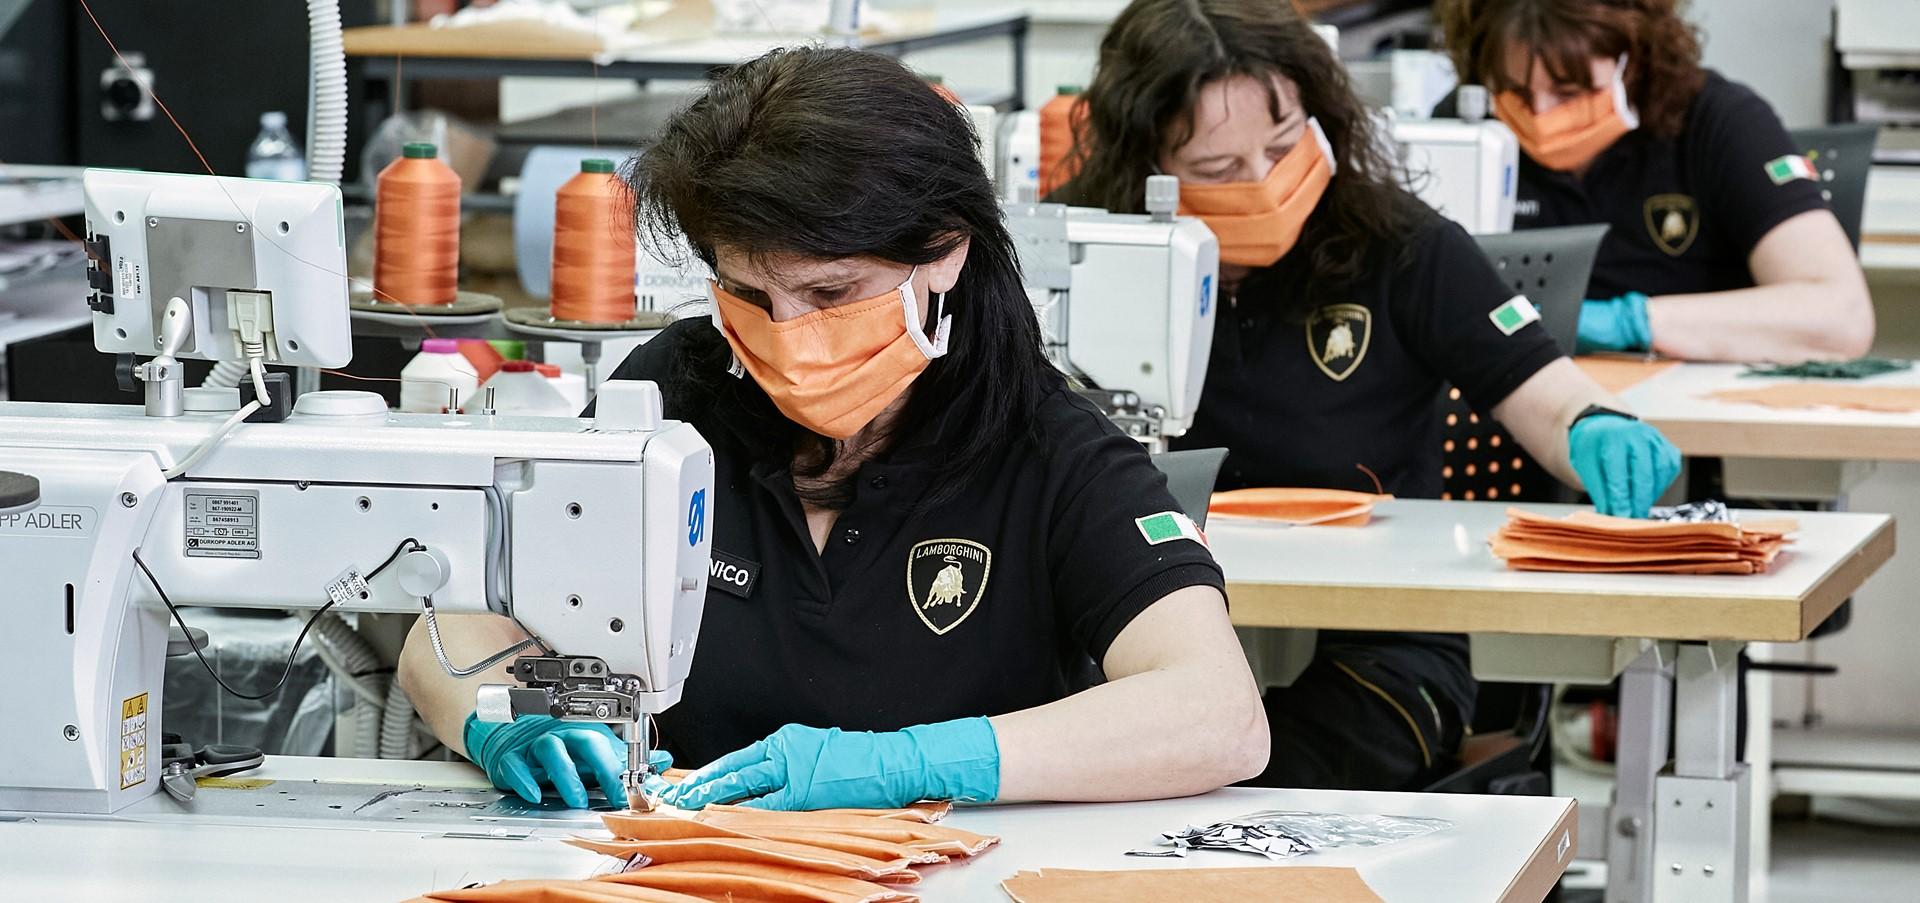 Automobili Lamborghini starts production of surgical masks